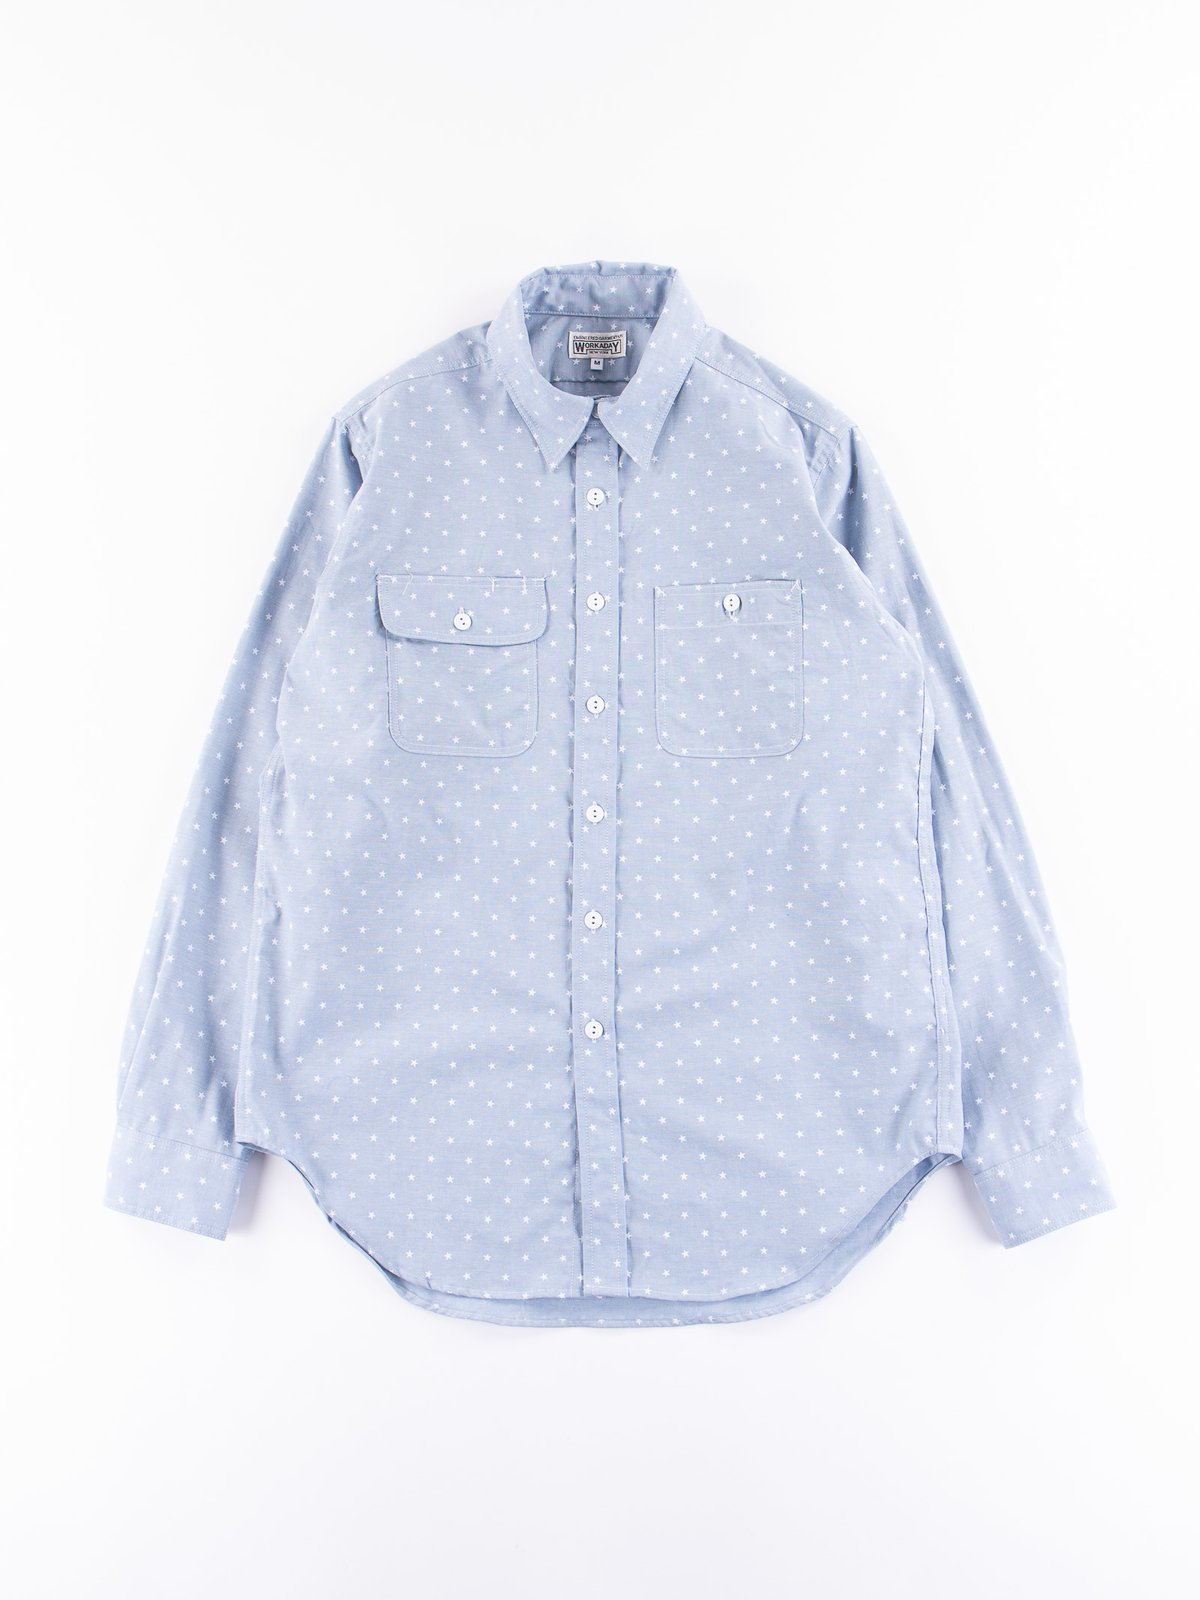 Light Blue Star Chambray Utility Shirt - Image 1